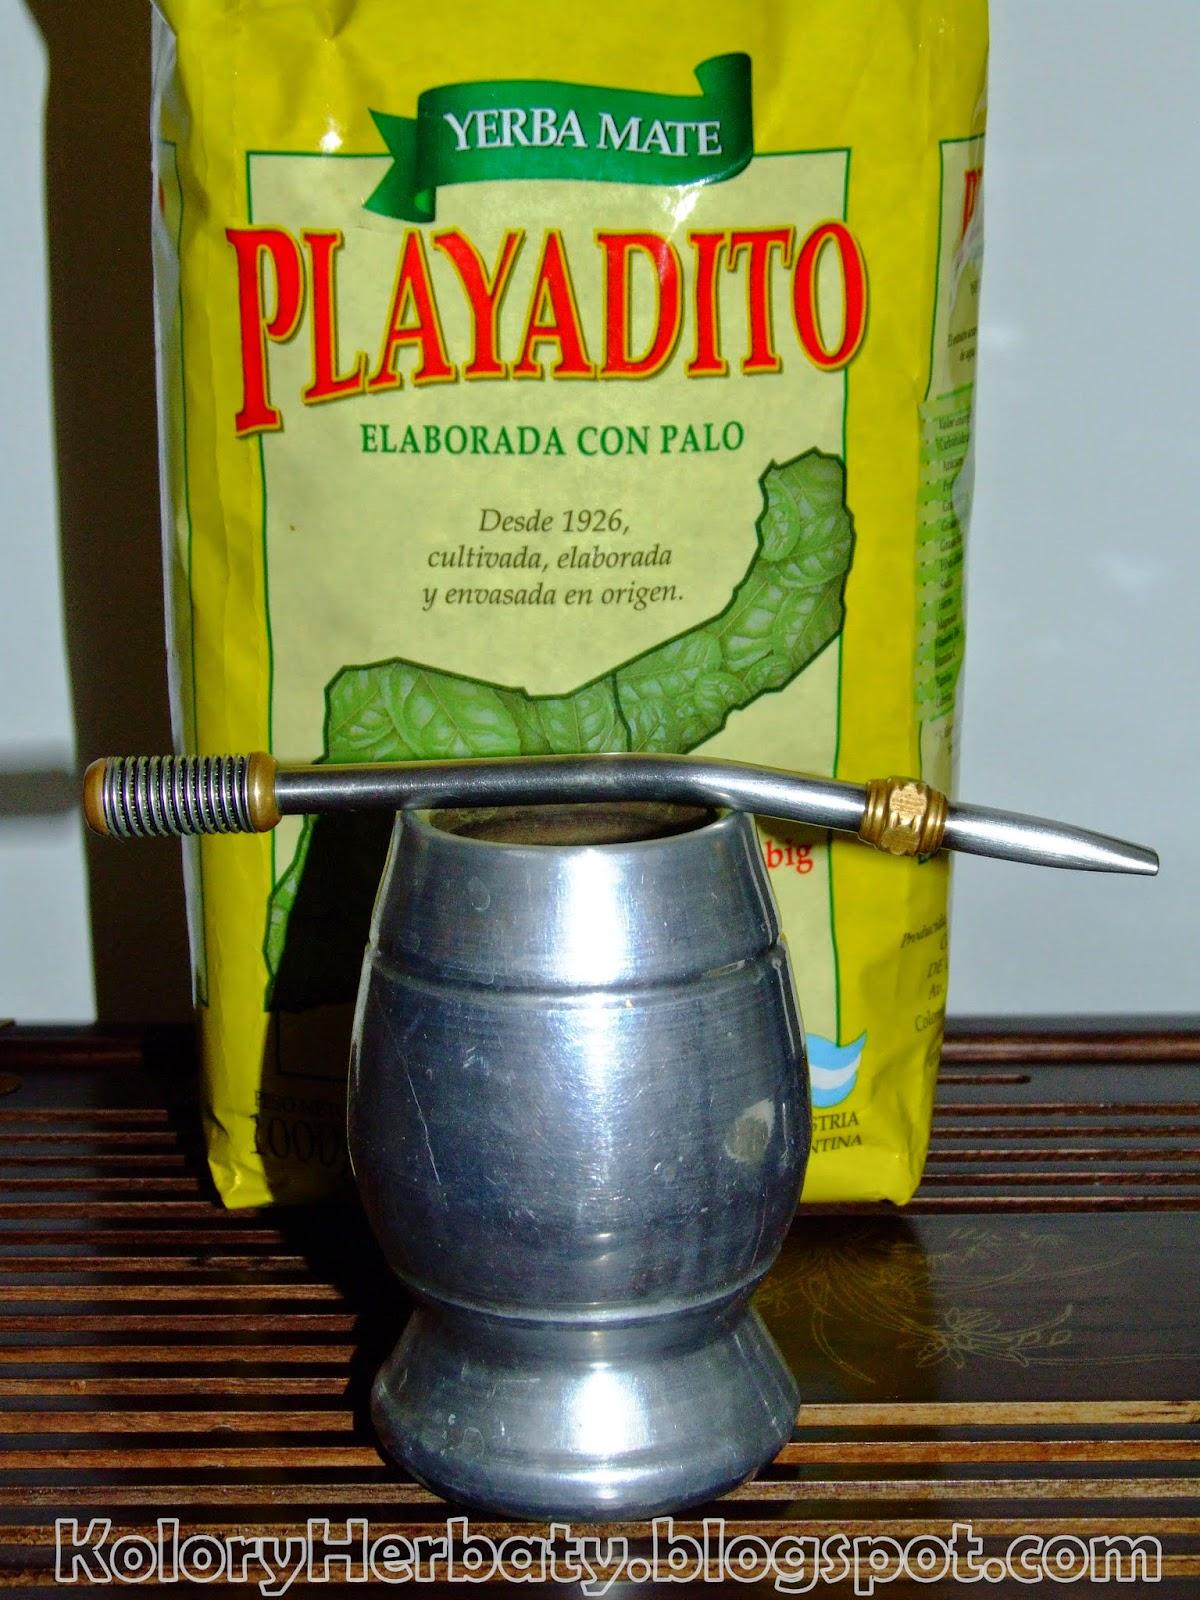 Playadito Elaborada Con Palo yerba mate argentyńska